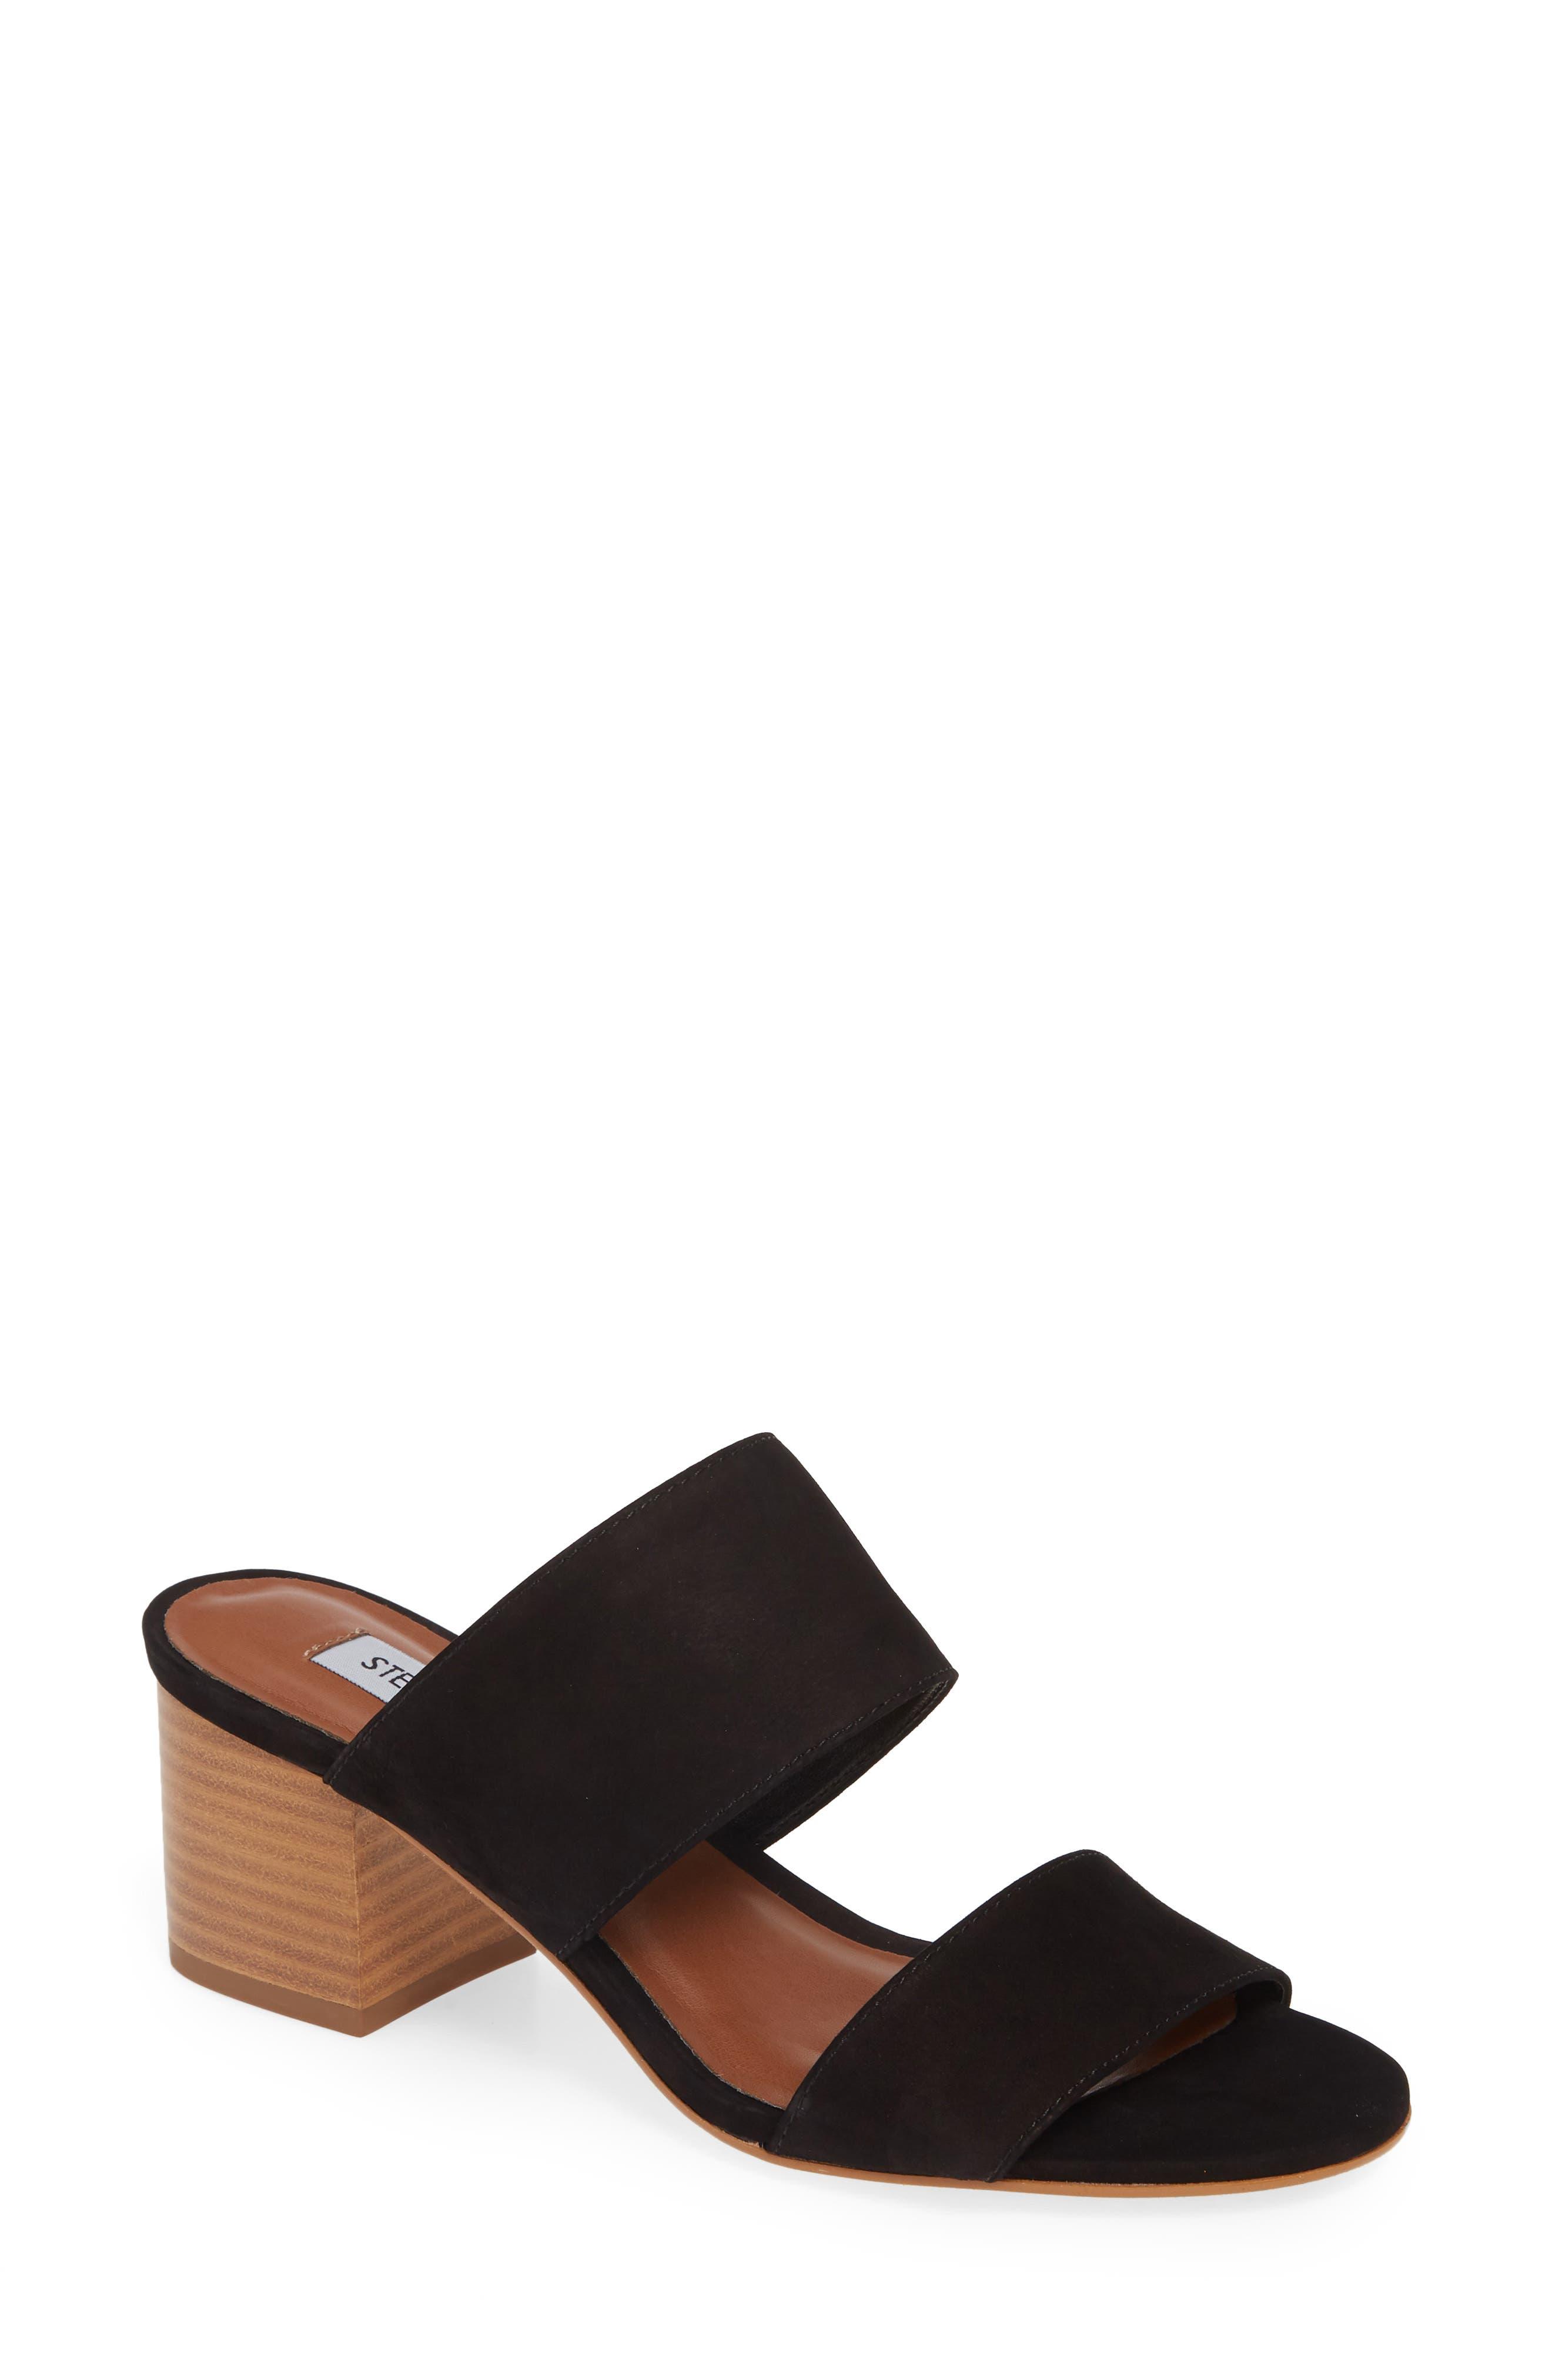 Ilena Block Heel Slide Sandal, Main, color, BLACK